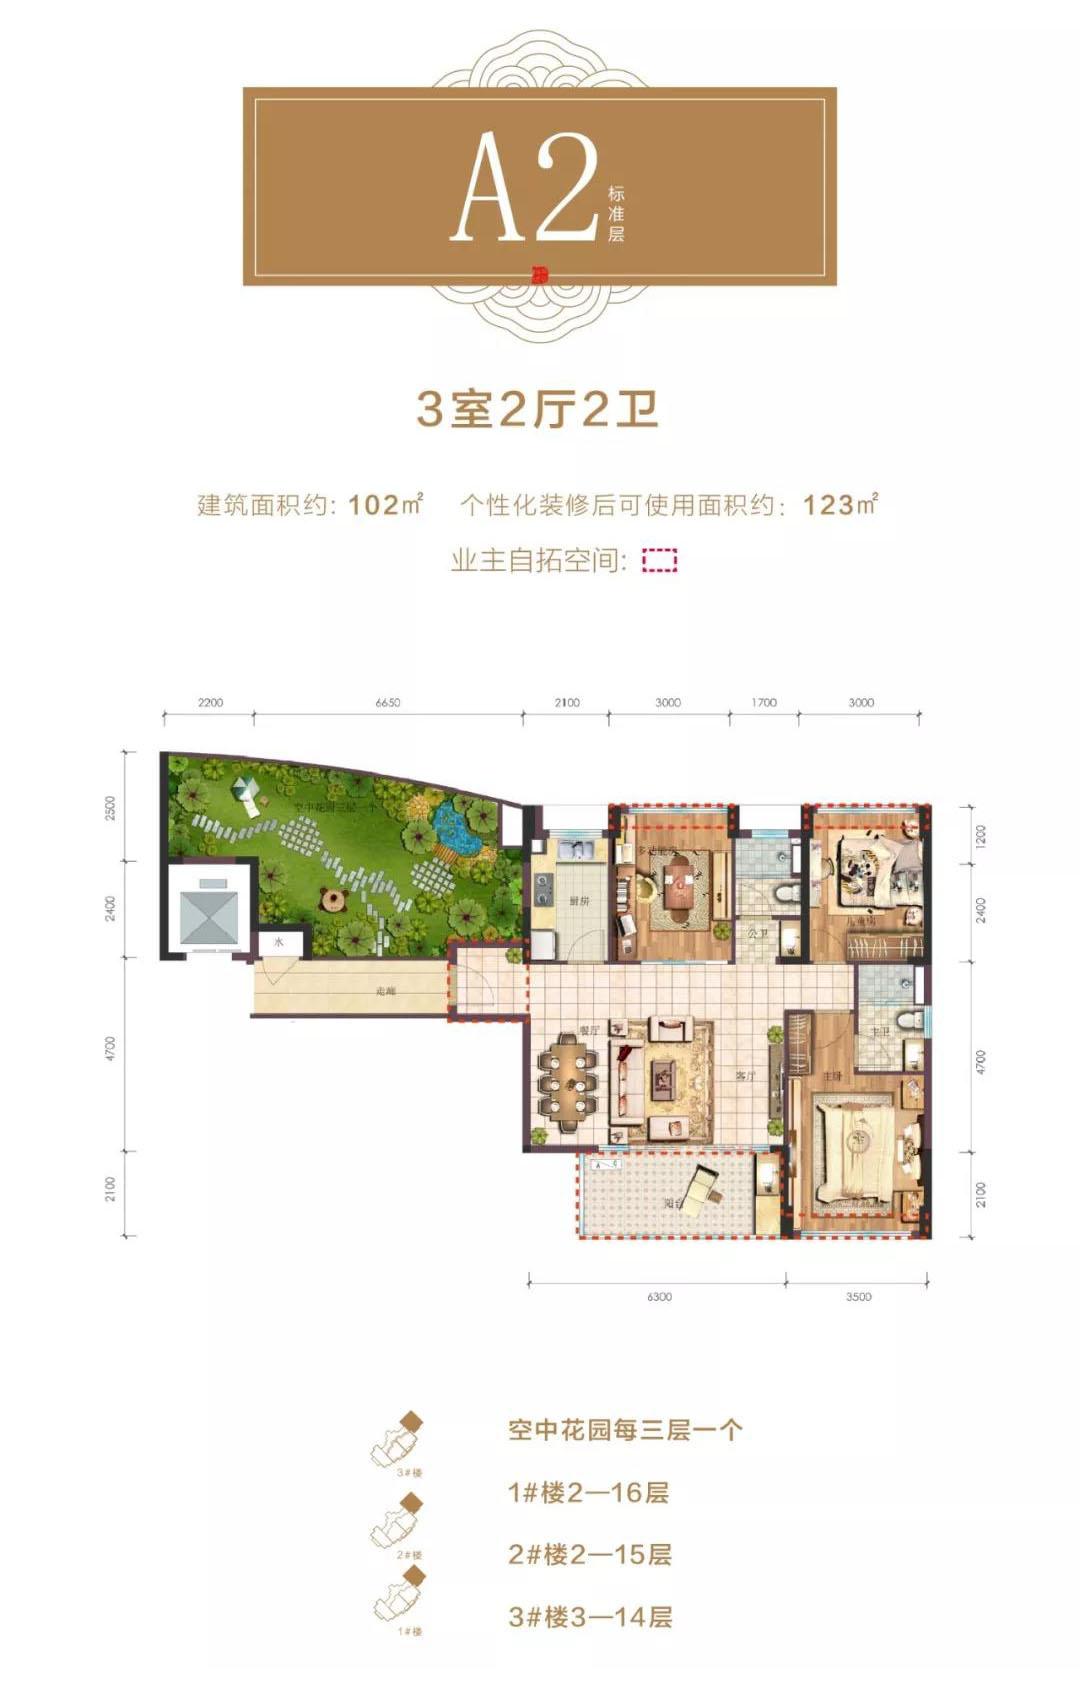 A2标准层建面约102㎡3室2厅2卫